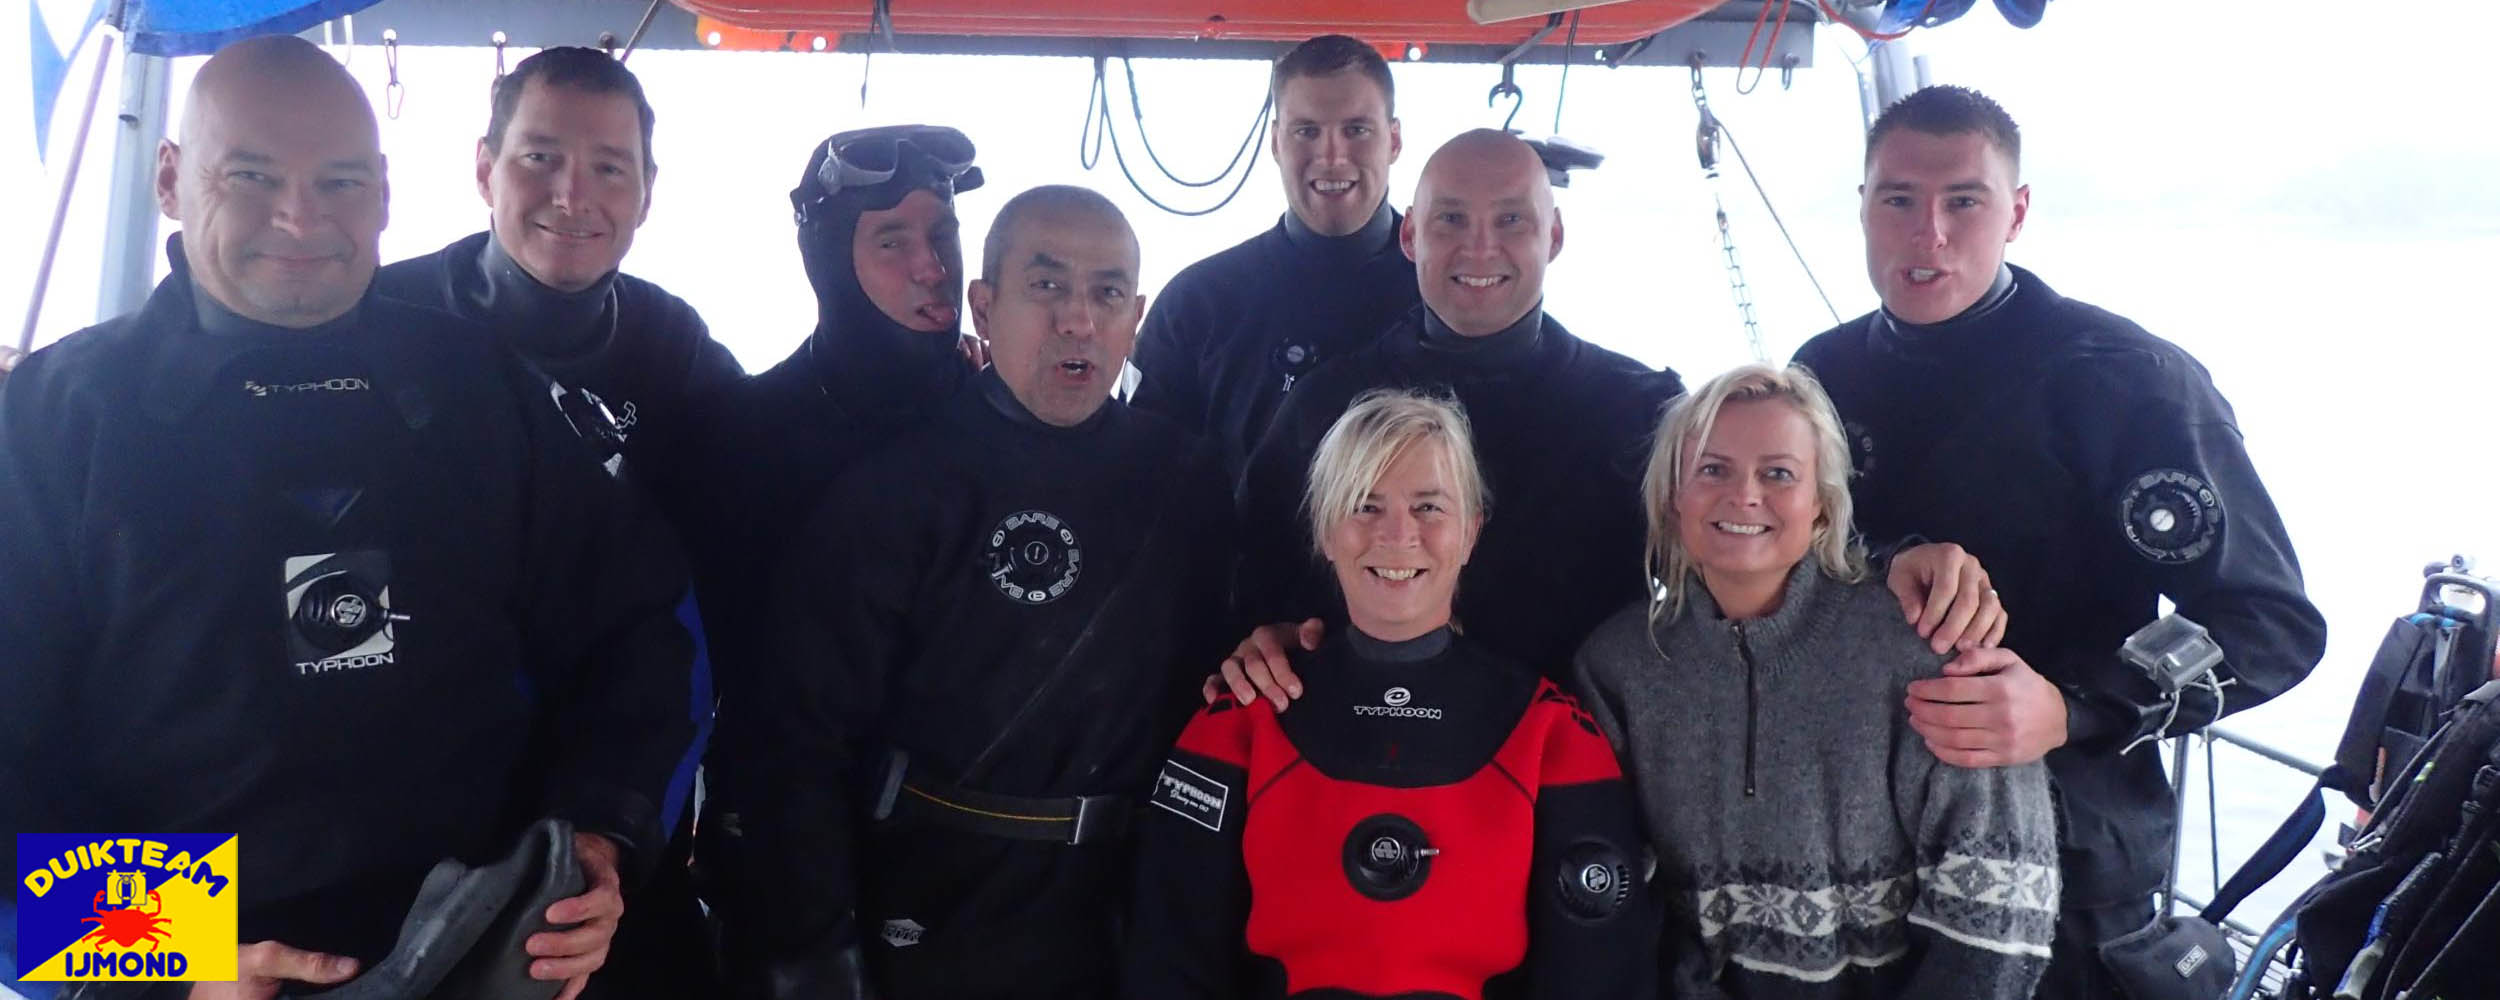 Duikteam IJmond duiken vanaf ons eigen duikschip